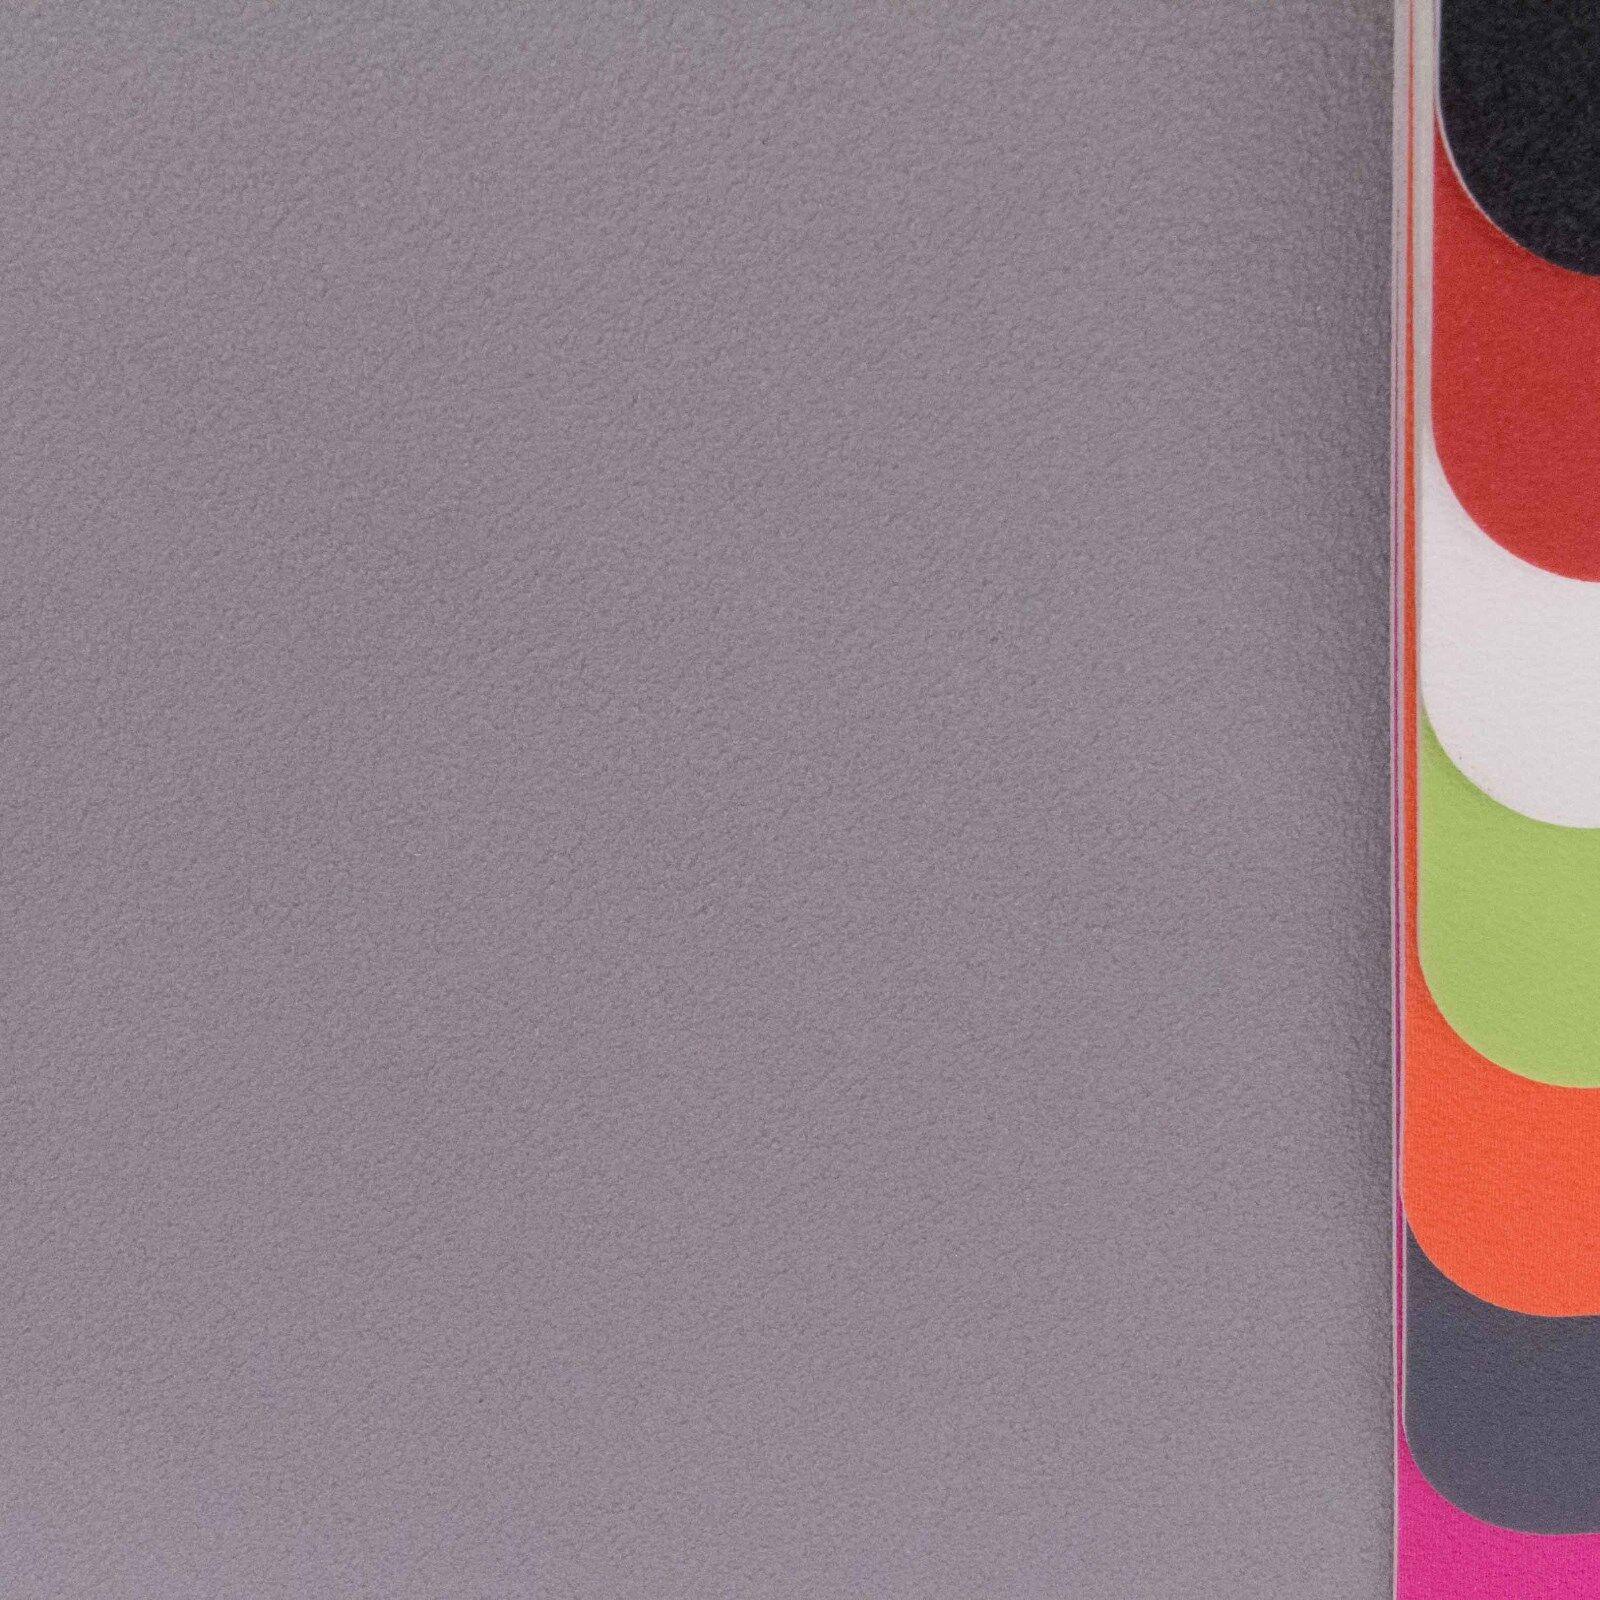 PVC Vinyl Bodenbelag Einfarbig Uni Grau Hell Breite 4 m - 1m²/